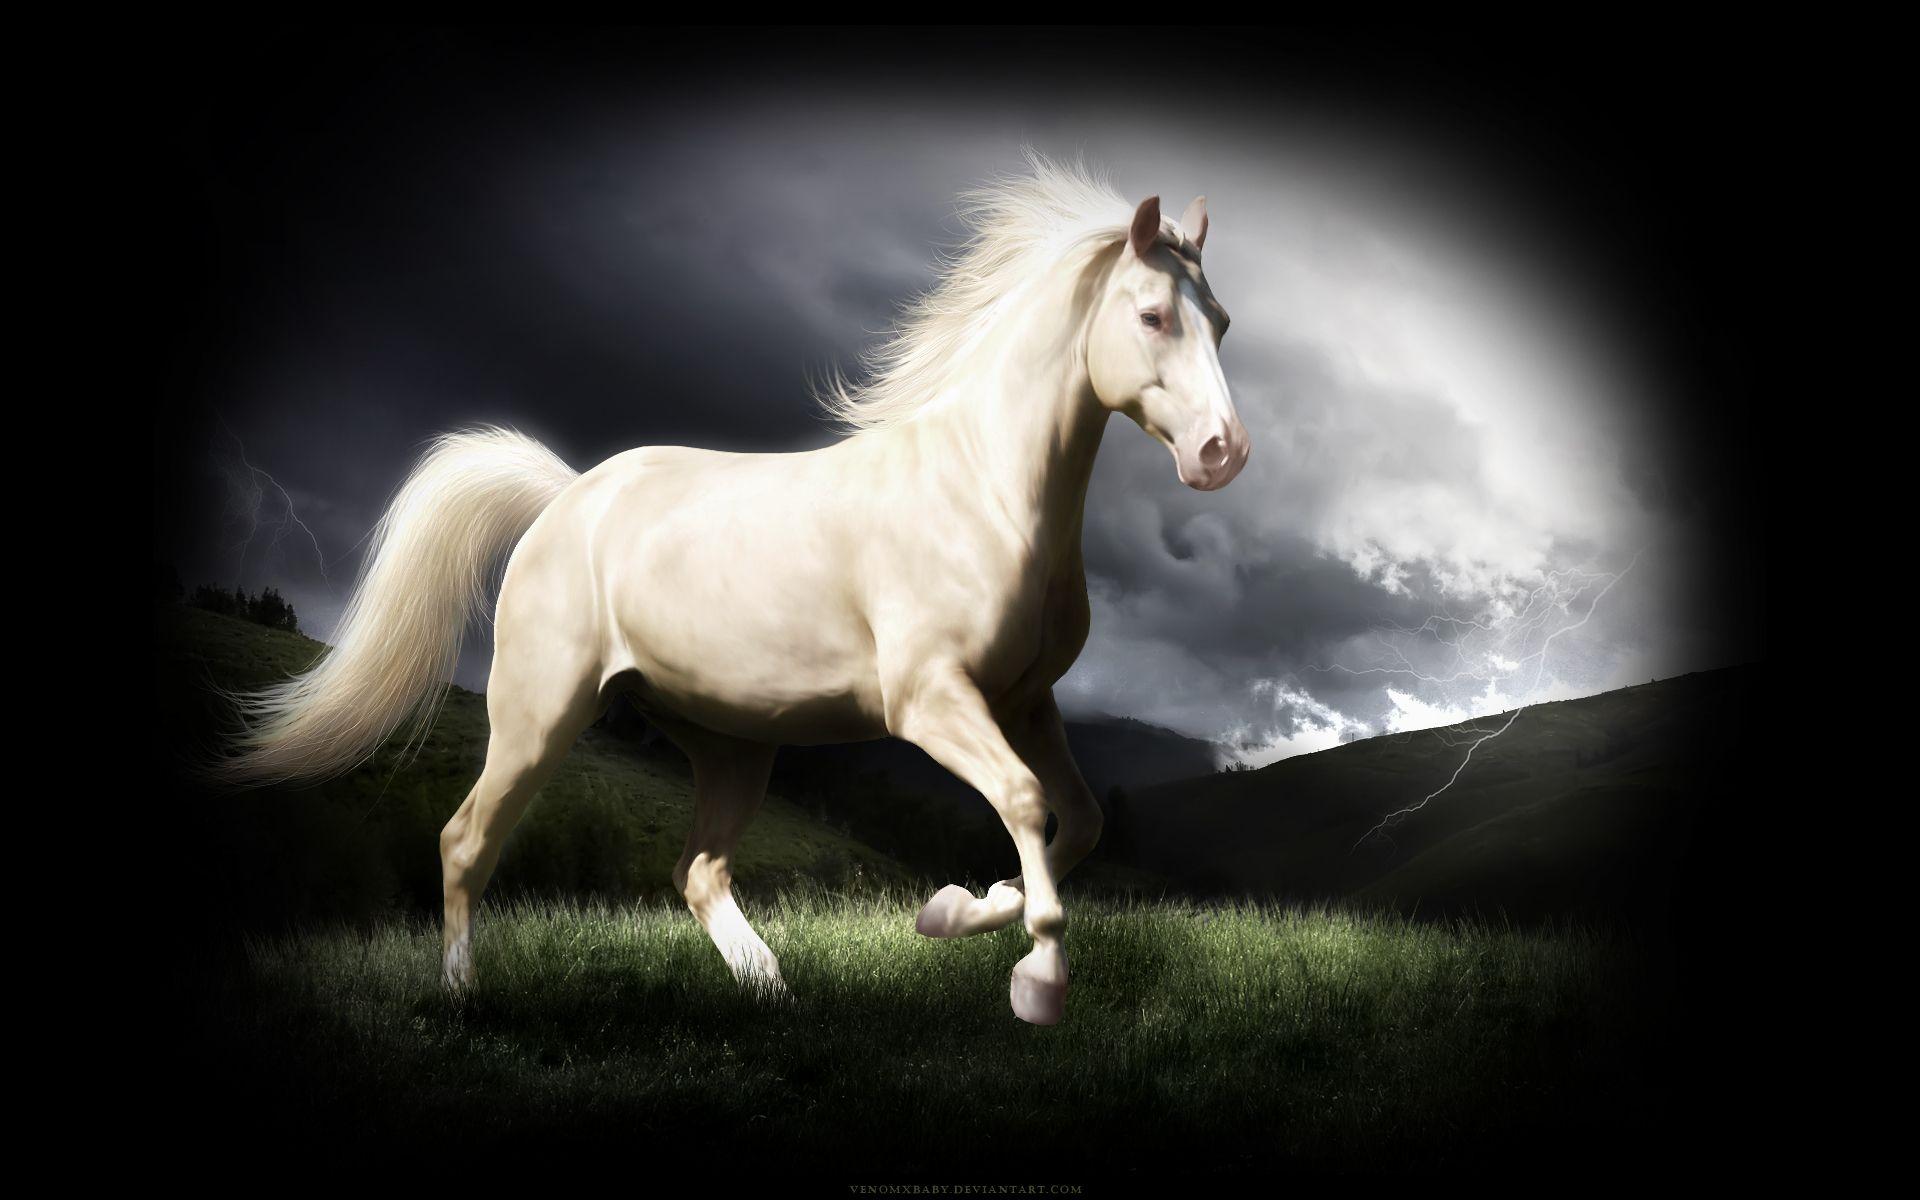 Best Wallpaper Horse Samsung Galaxy - 228dbe214b625bbee8b6336ee10c75d2  Pic_89374.jpg